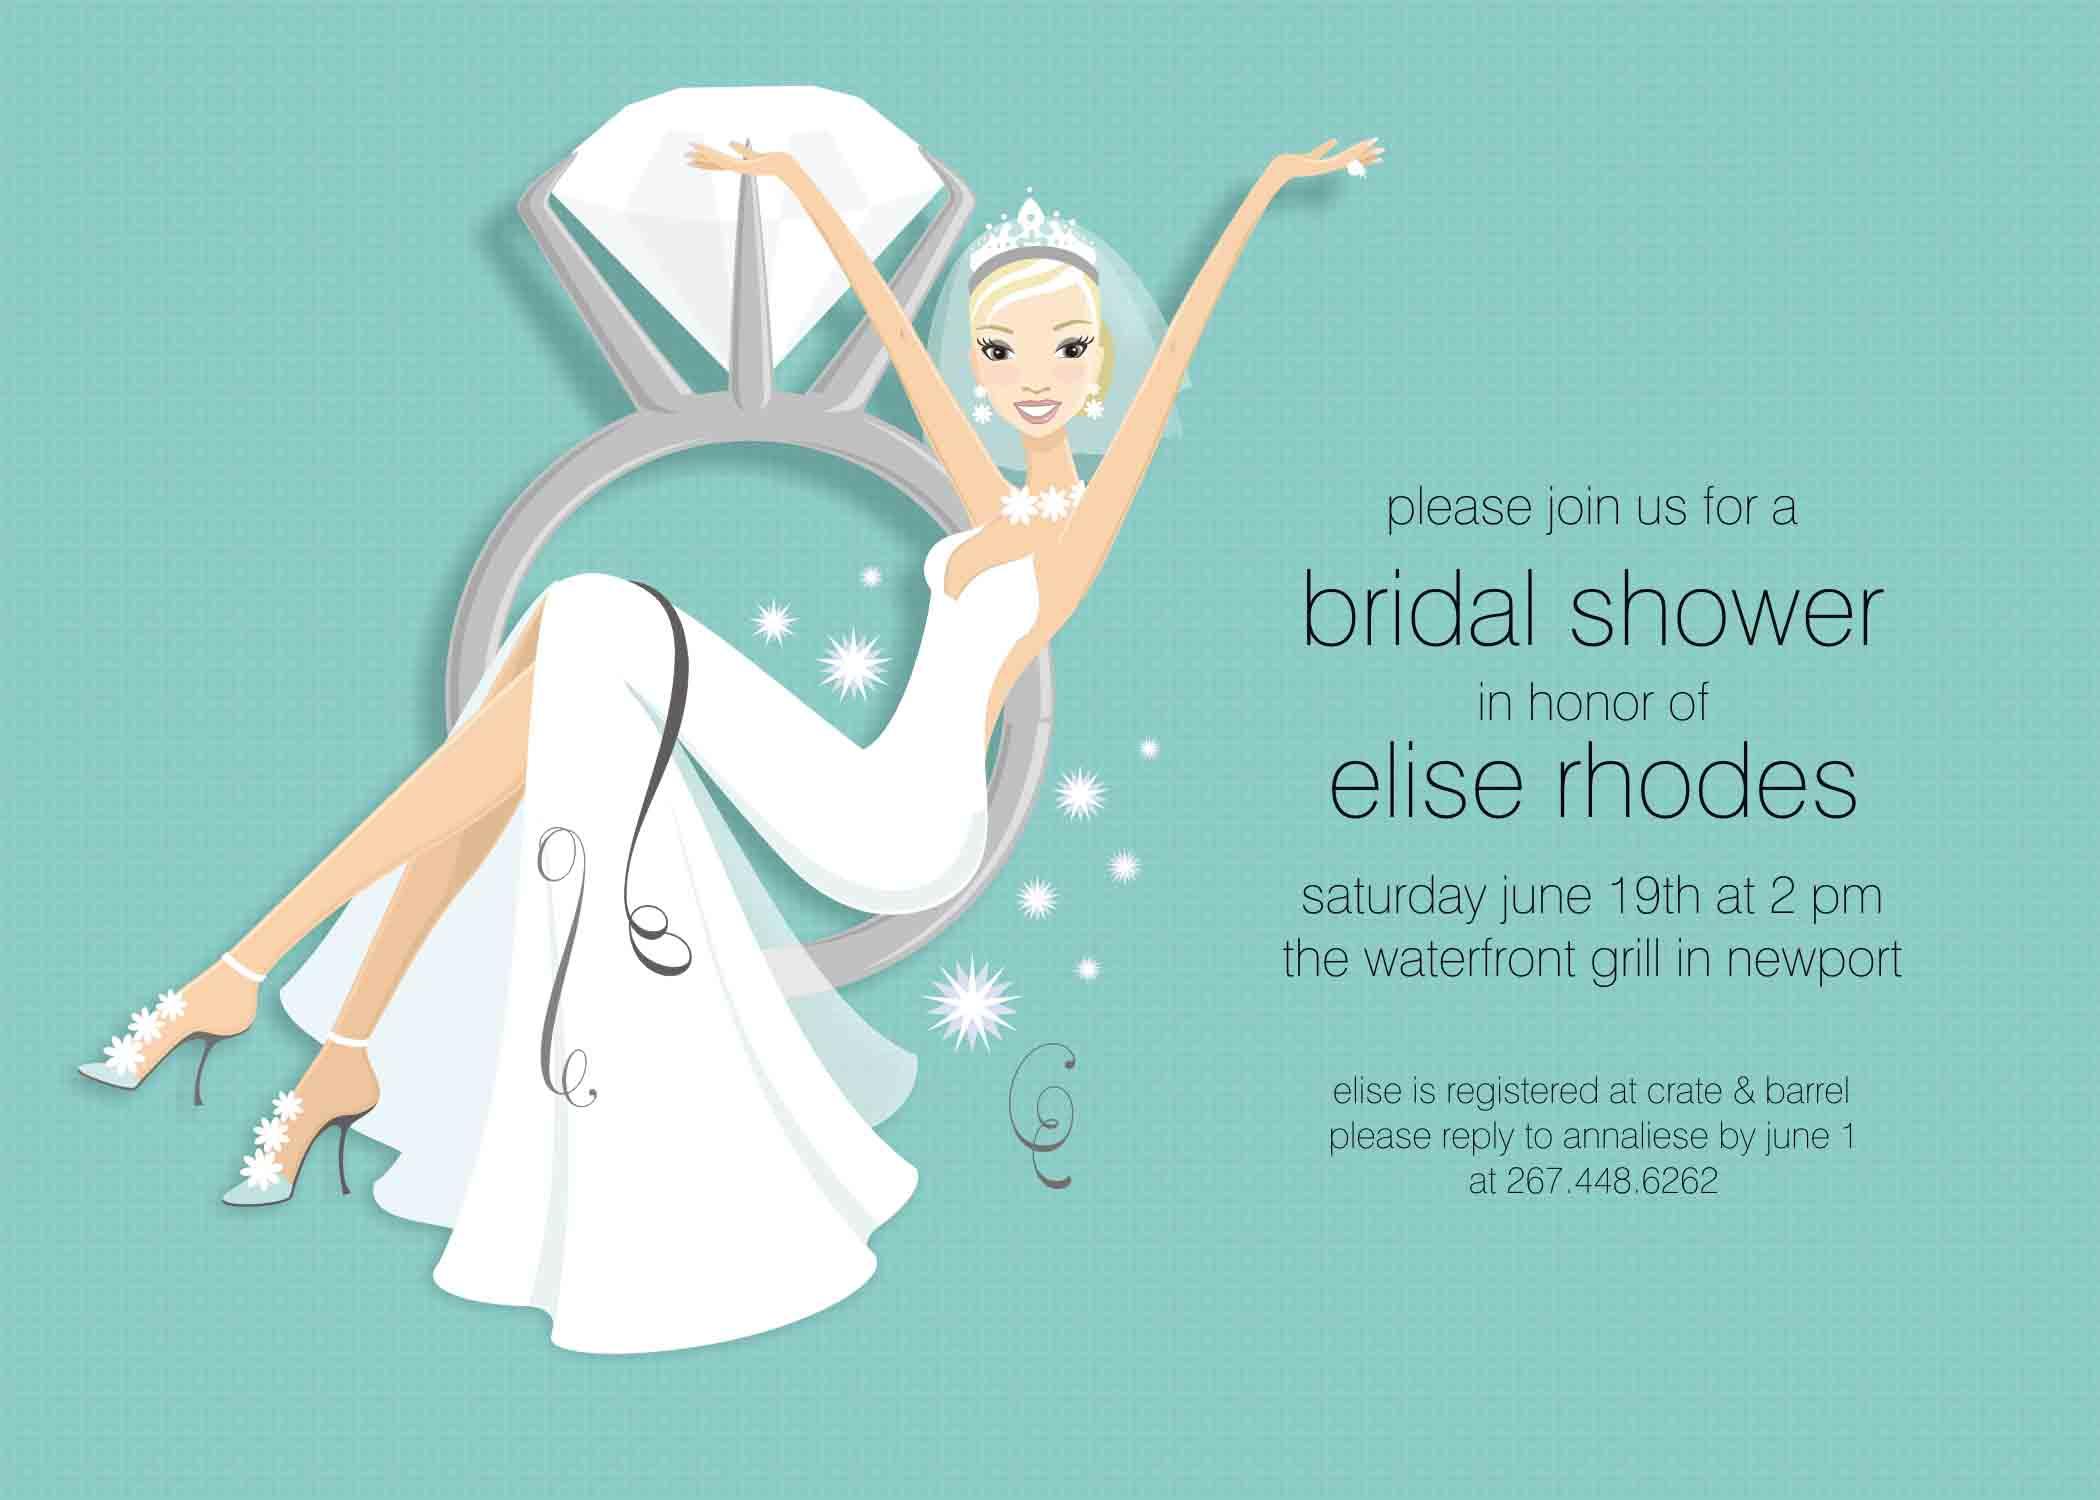 wedding shower invitation clipart  clipart kid, Bridal shower invitations